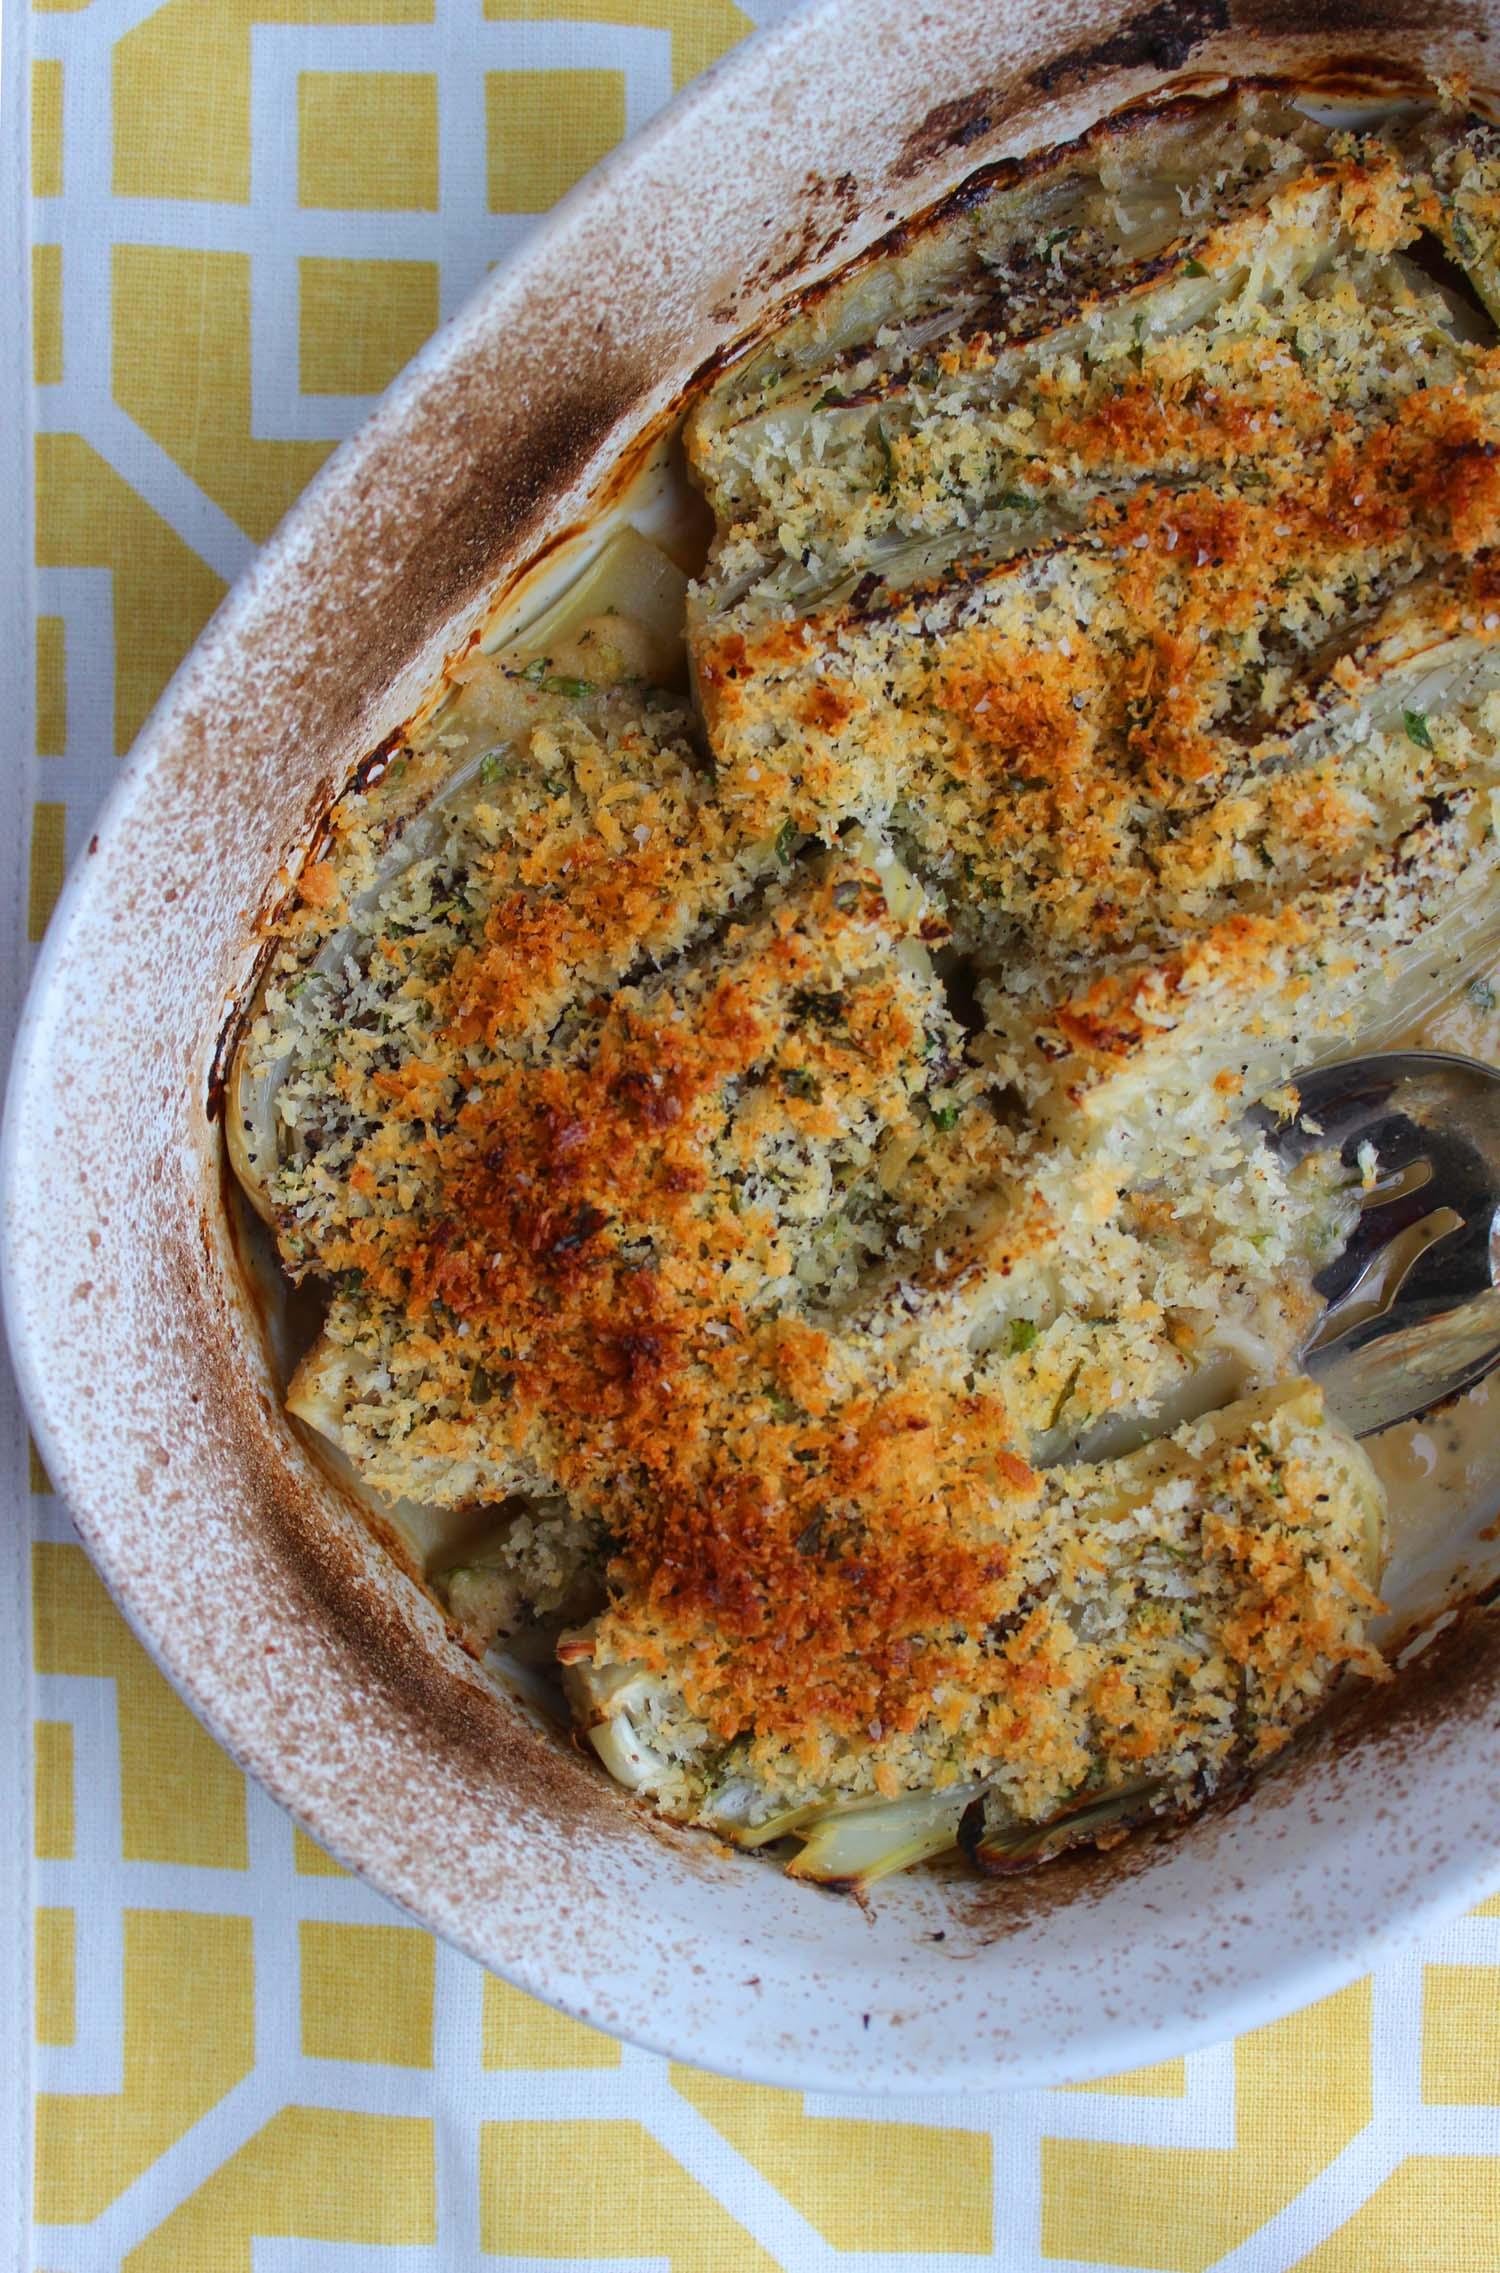 Parmesan Fennel Gratin     | Image:  Laura Messersmith